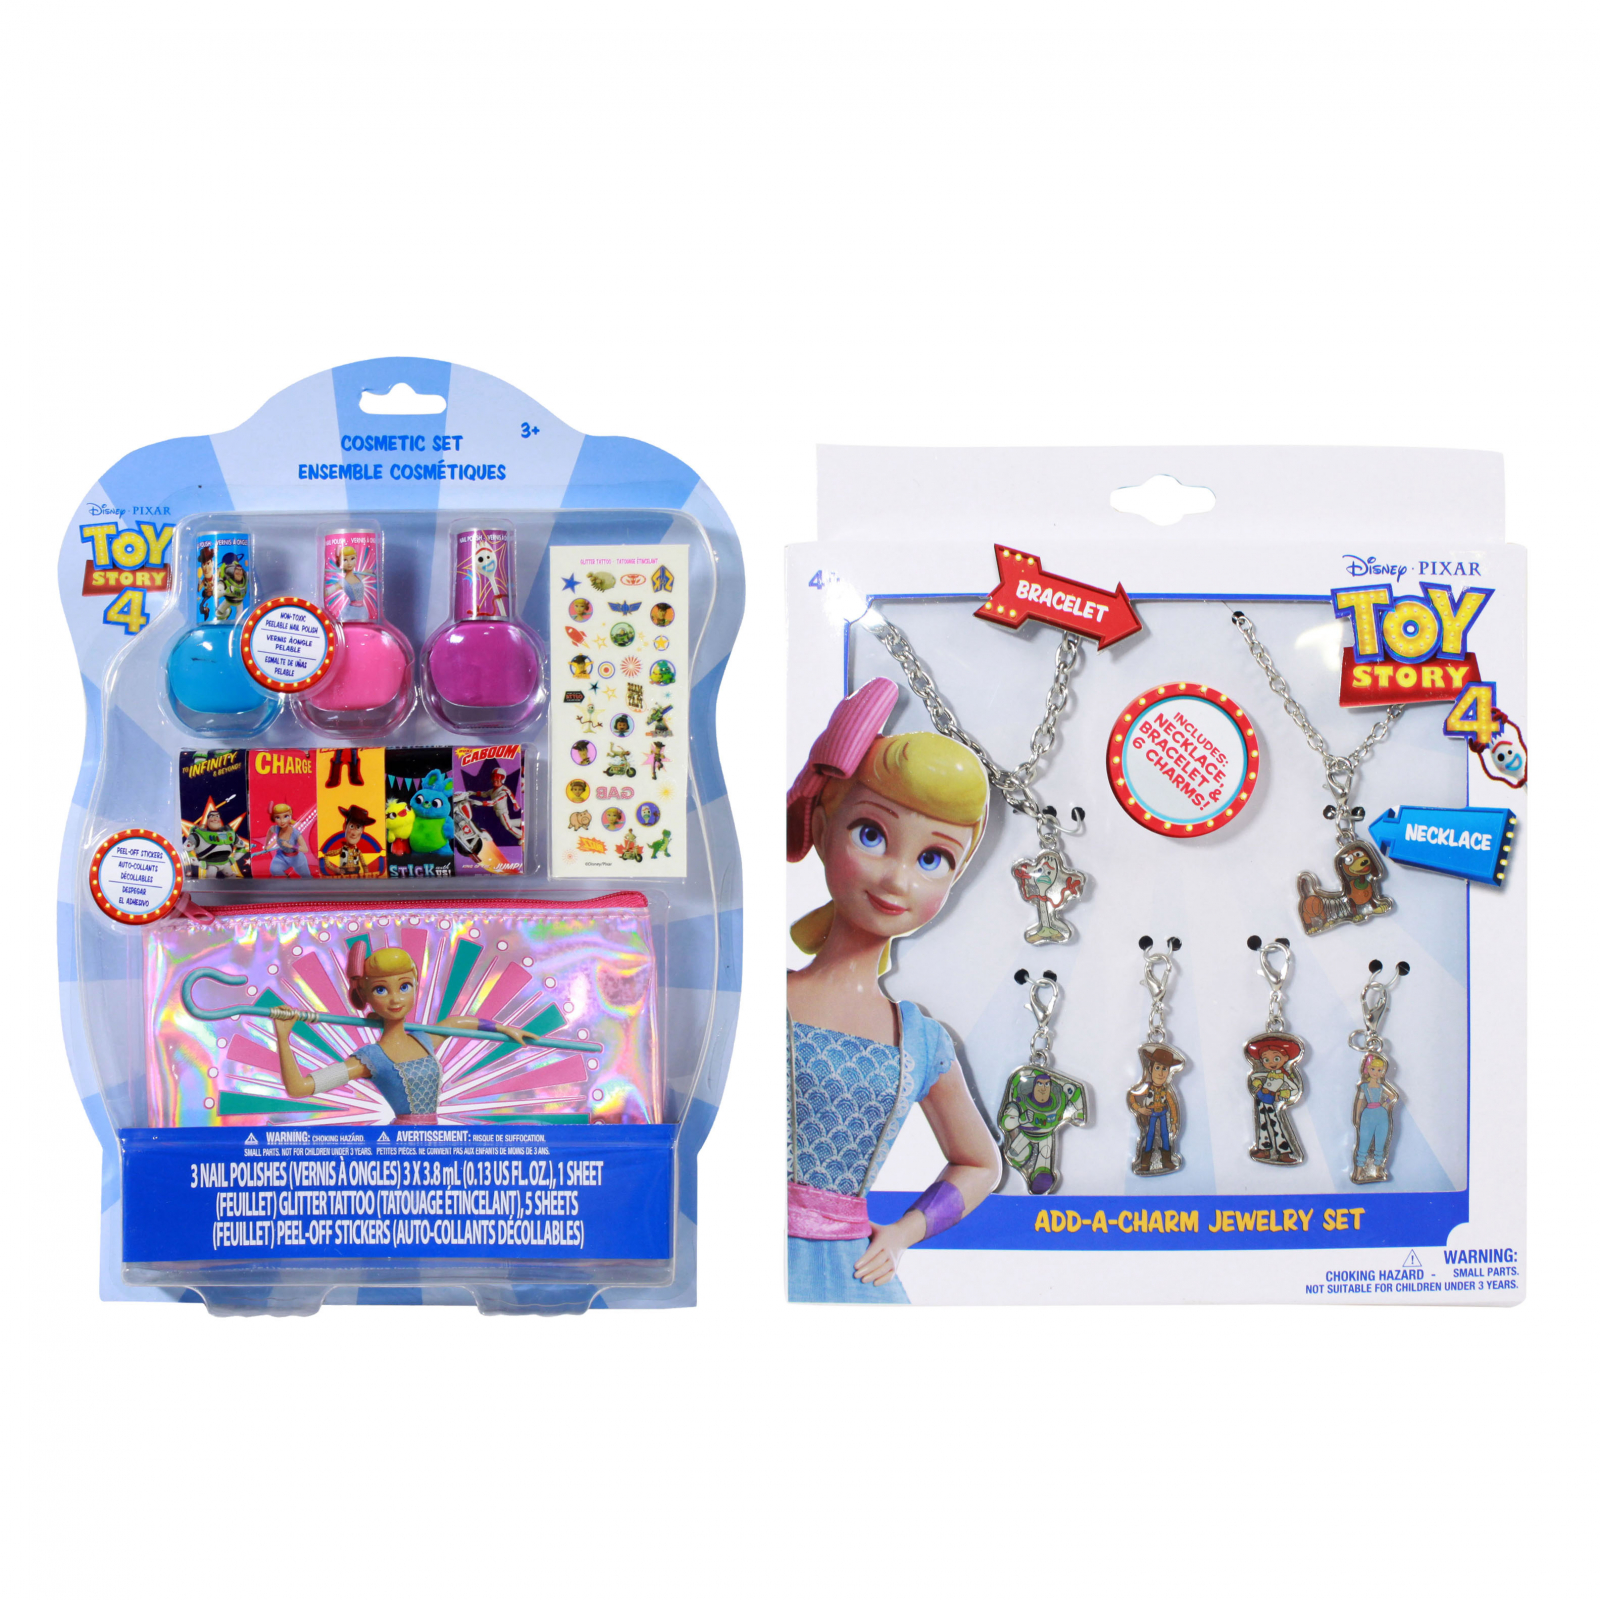 Disney Pixar Toy Story 4 Girls Dress Up Gift Set 18 Pieces